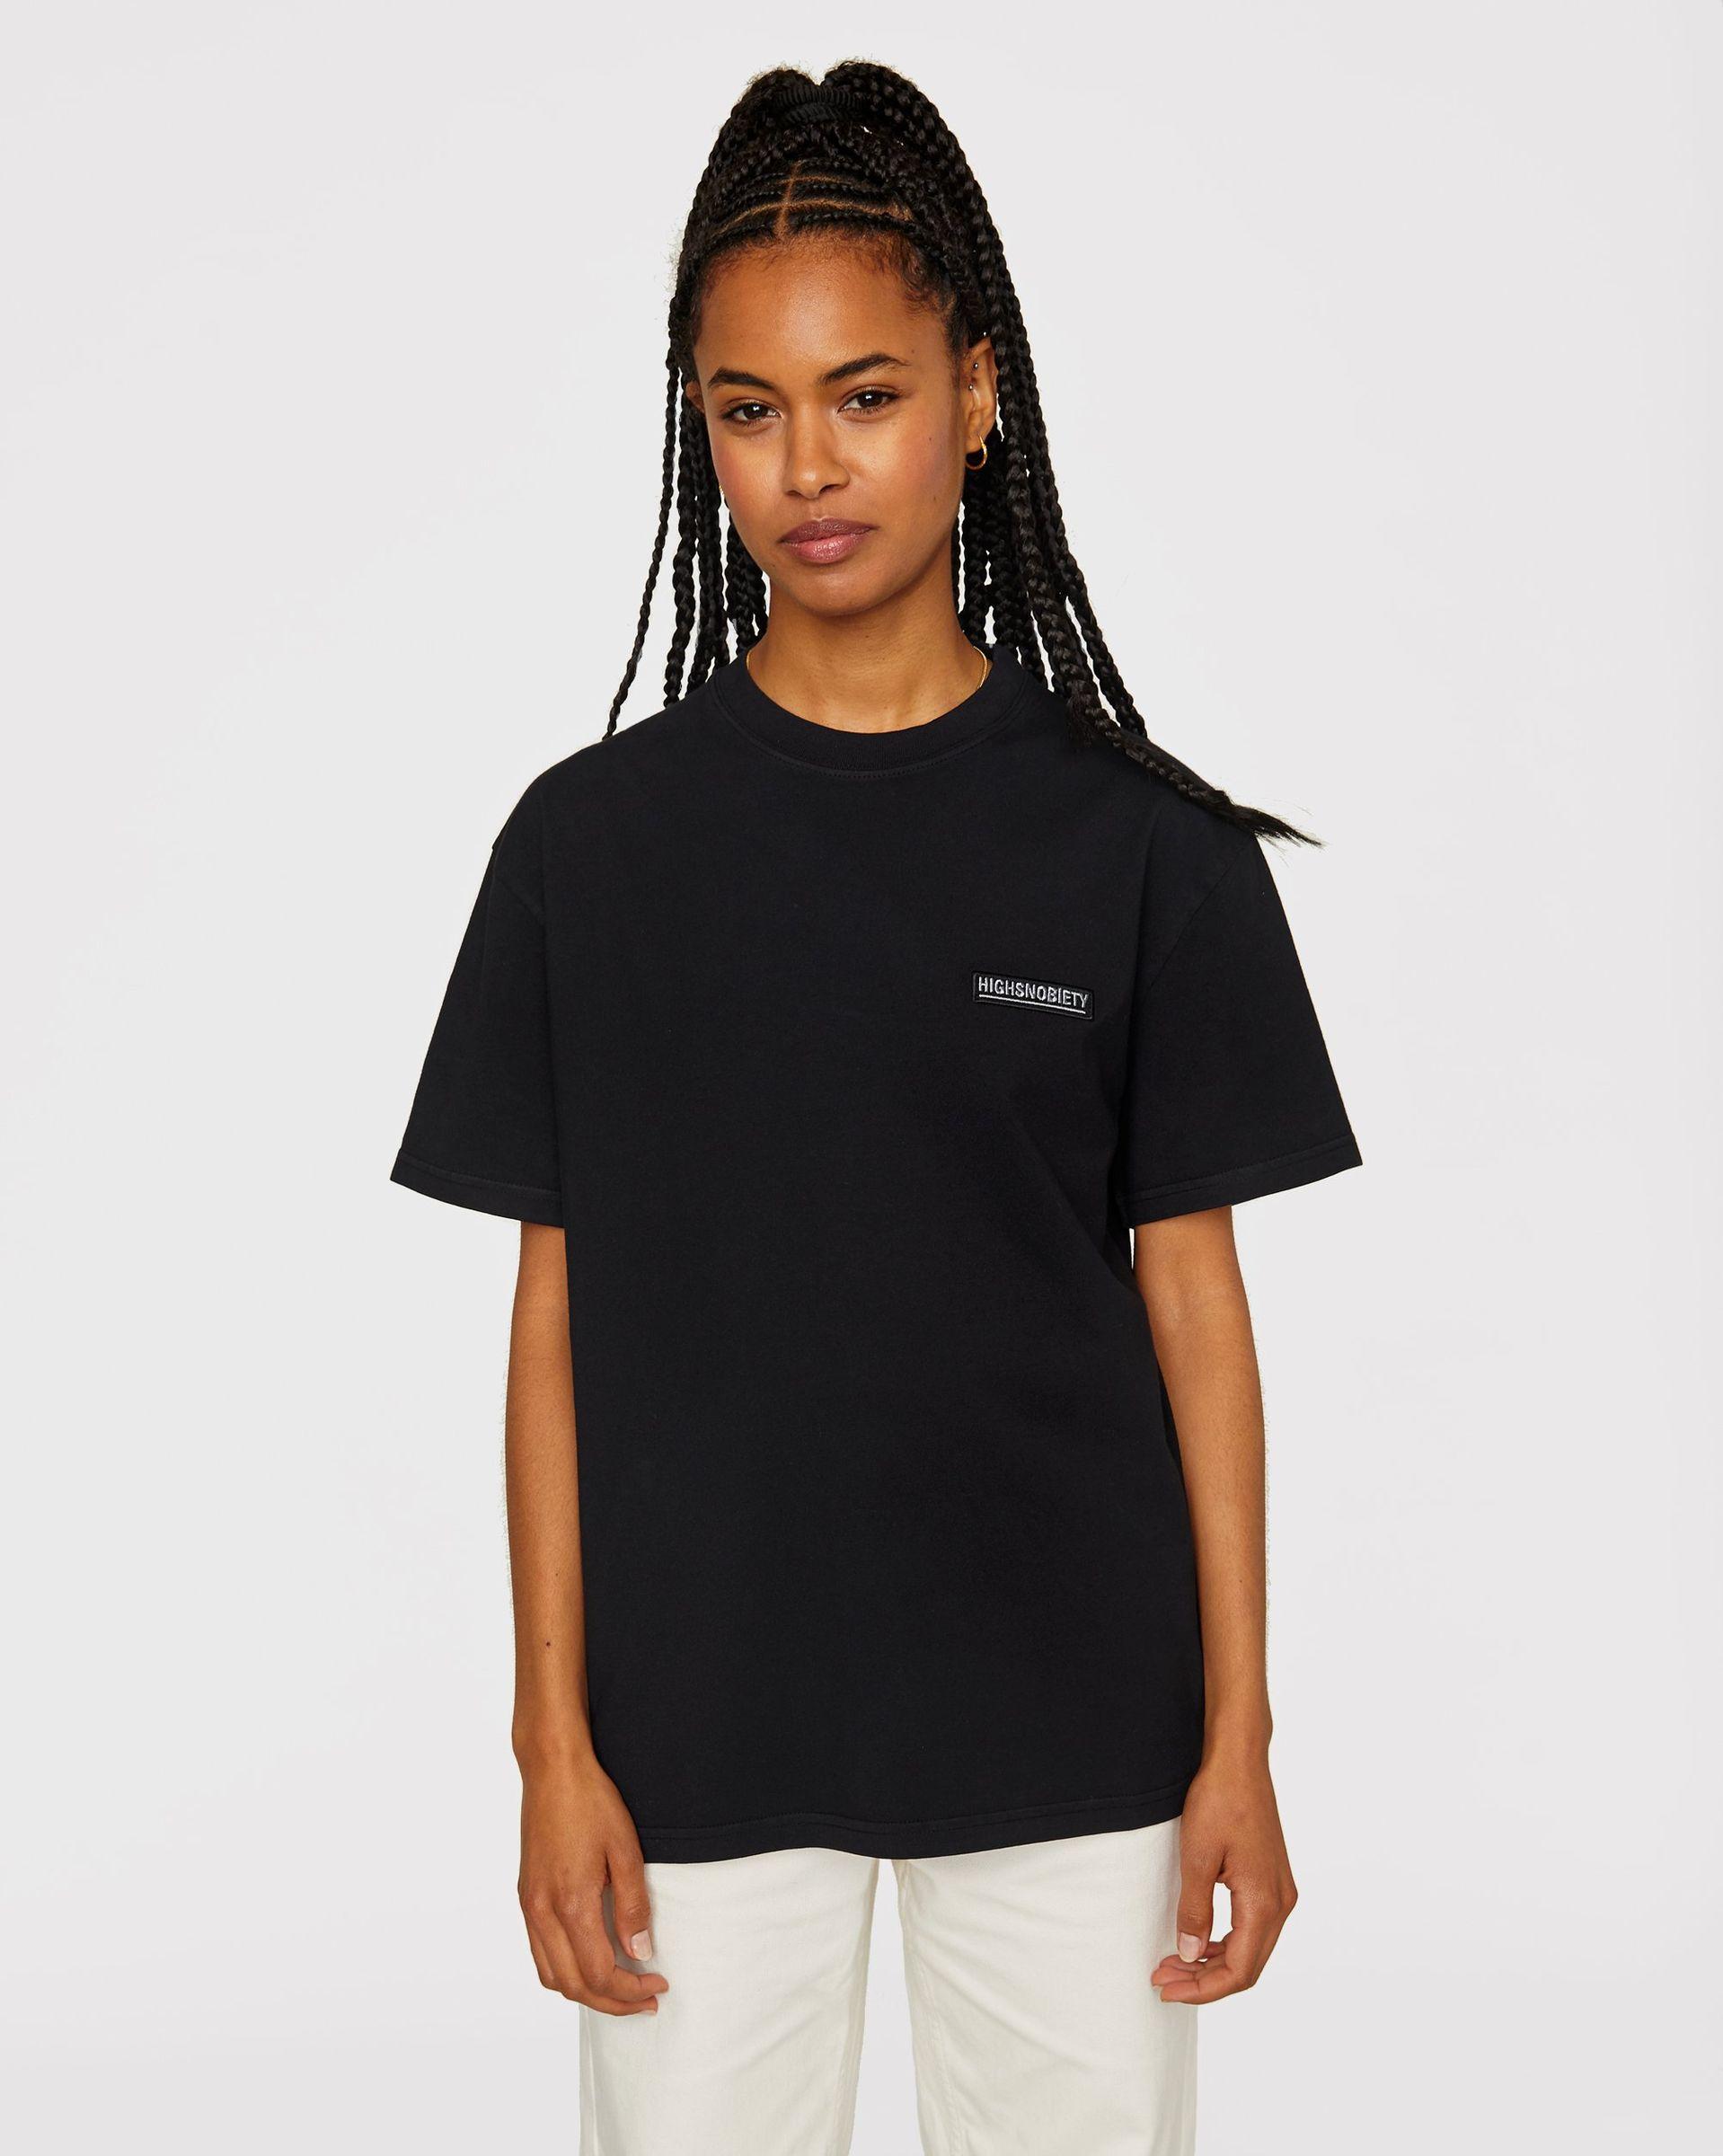 Highsnobiety Staples - T-Shirt Black - Image 6